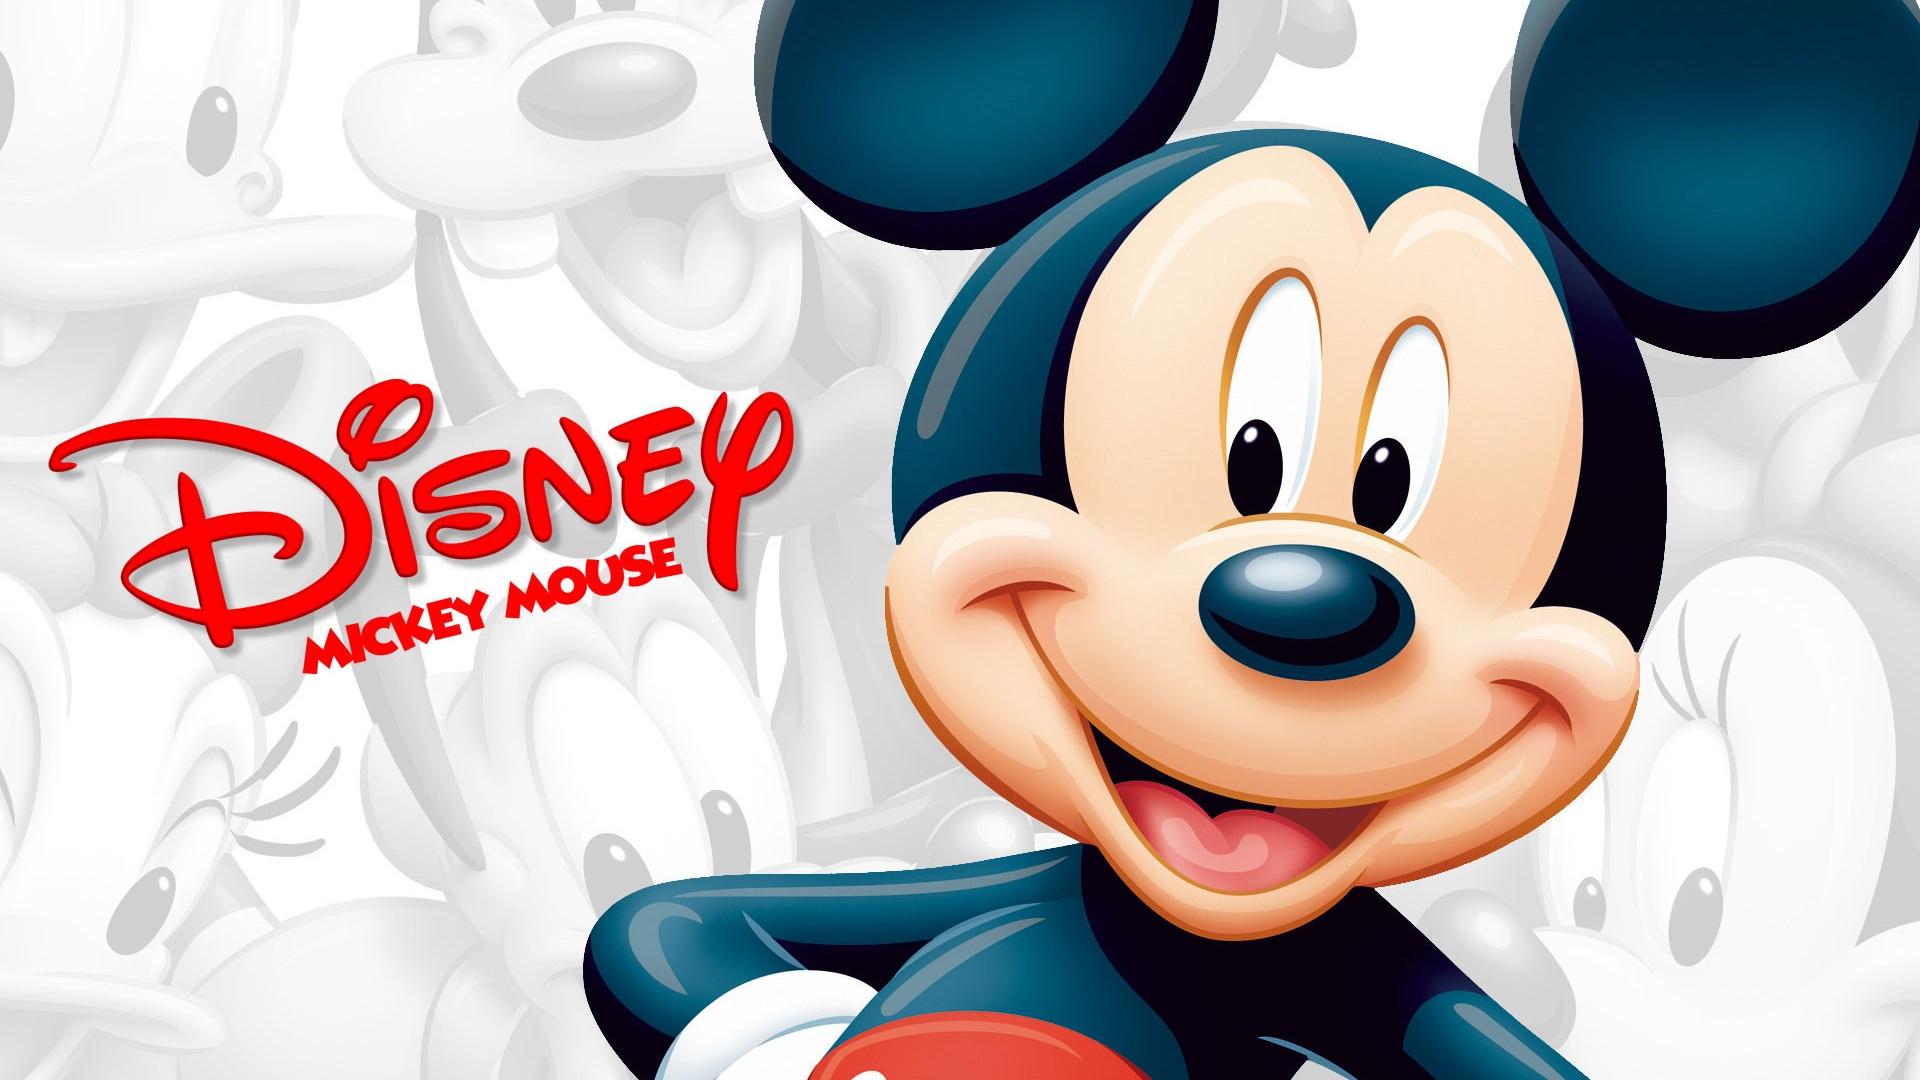 disney mickey mouse étoile fonds d'écran x fonds d'écran